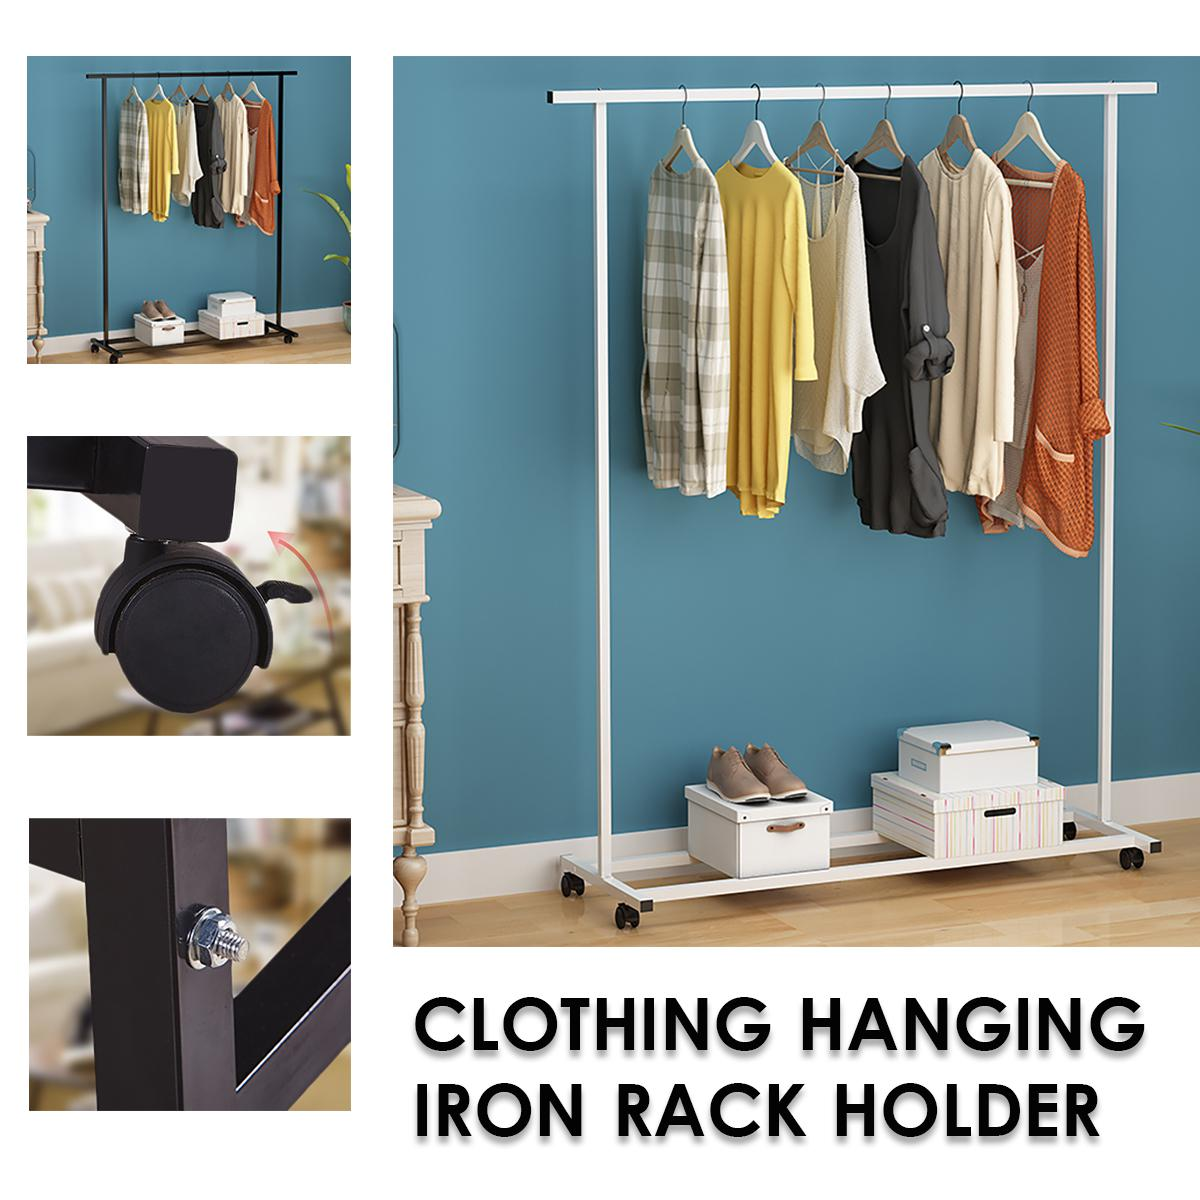 clothes garment rack metal coat rack shelf storage holder shoes storage shelf holder hanger 100 x 40 x 130 cm bedroom home shelf organizer white